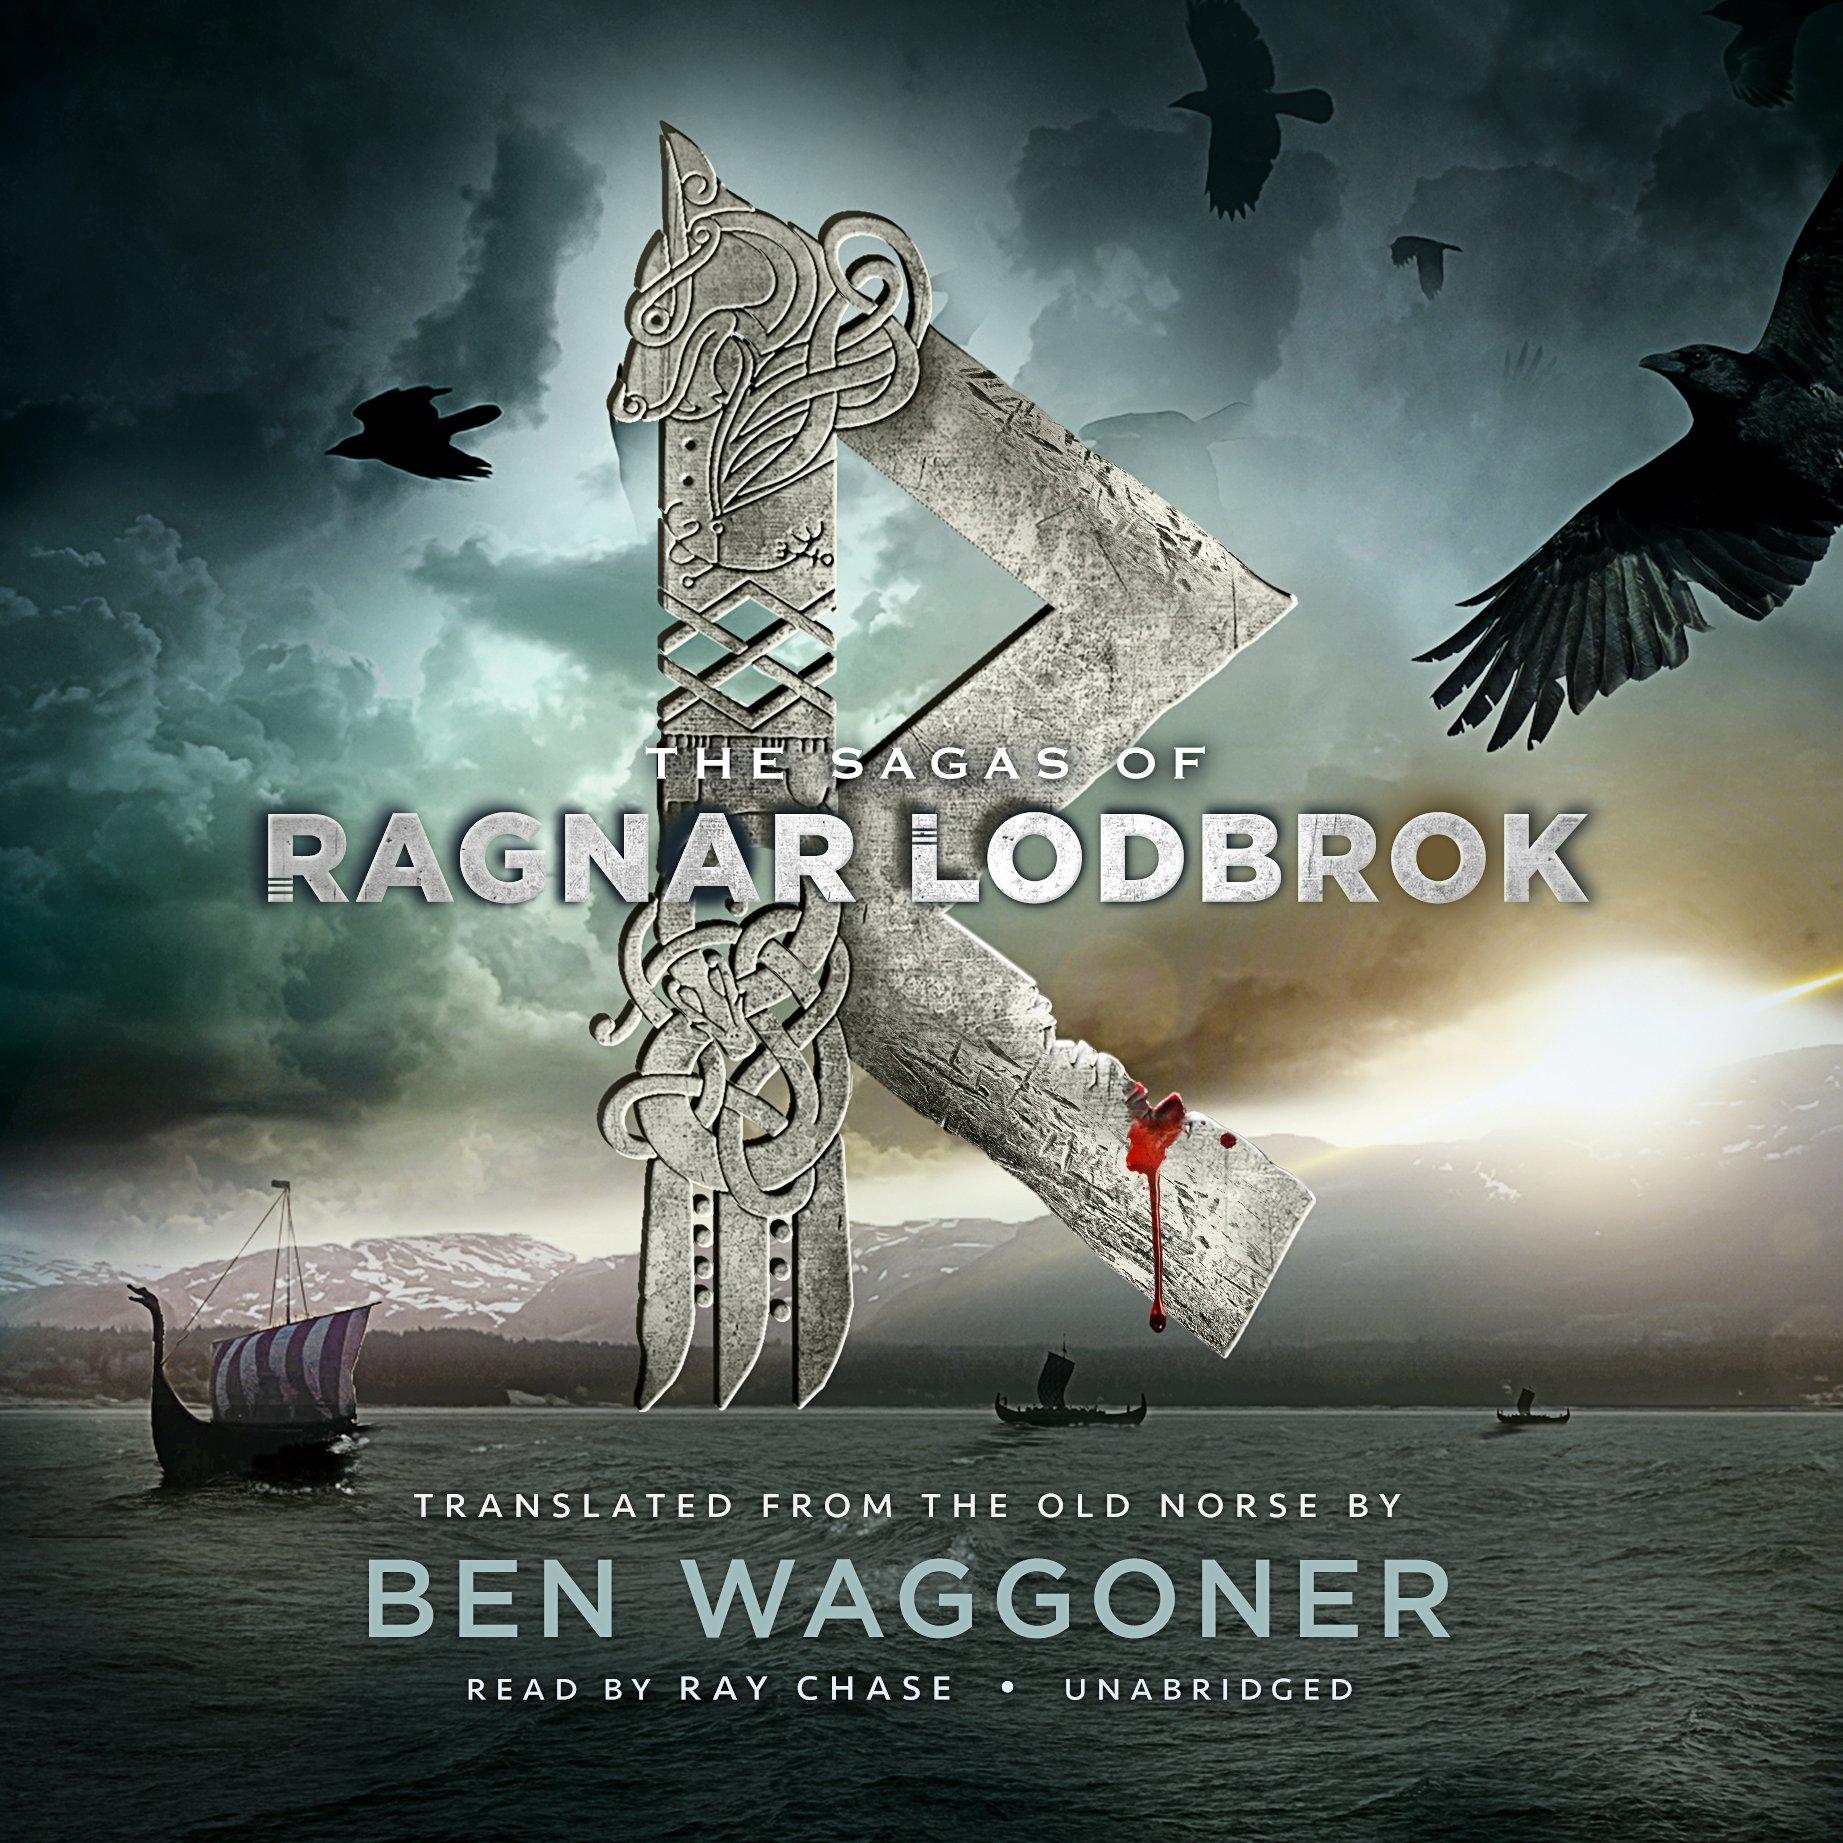 The Sagas of Ragnar Lodbrok: Amazon.co.uk: Ben Waggoner ...